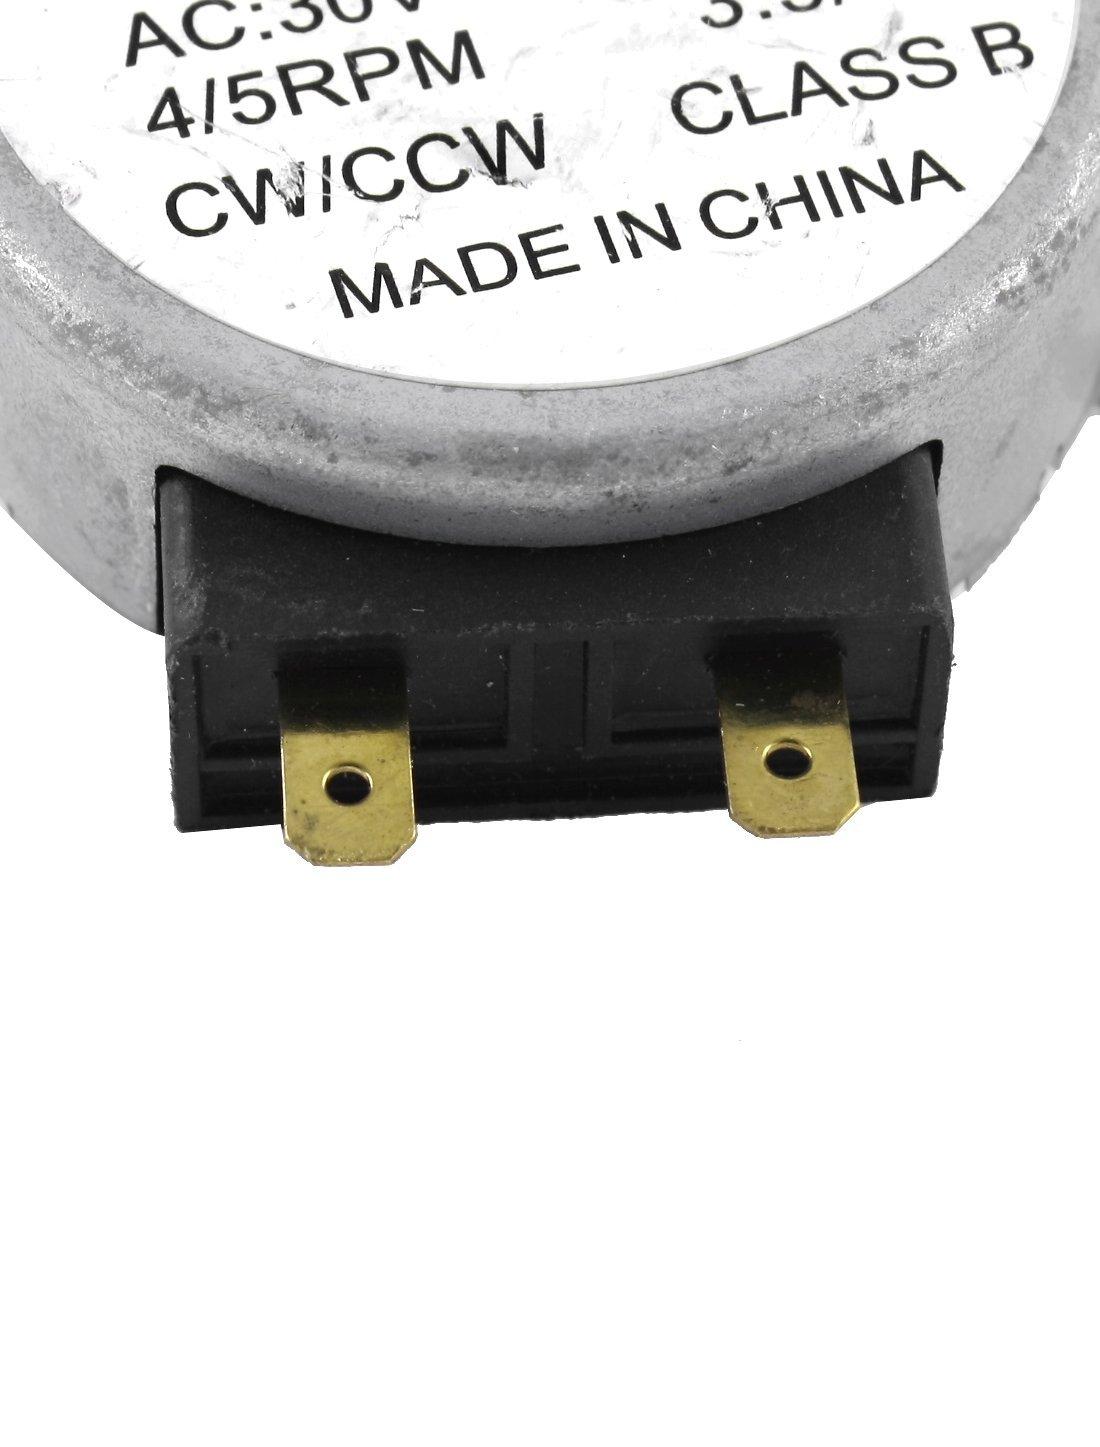 AC 30V 3.5 / 4W 4/5 rpm Synchronous Motor 49TYZ para Microondas ...